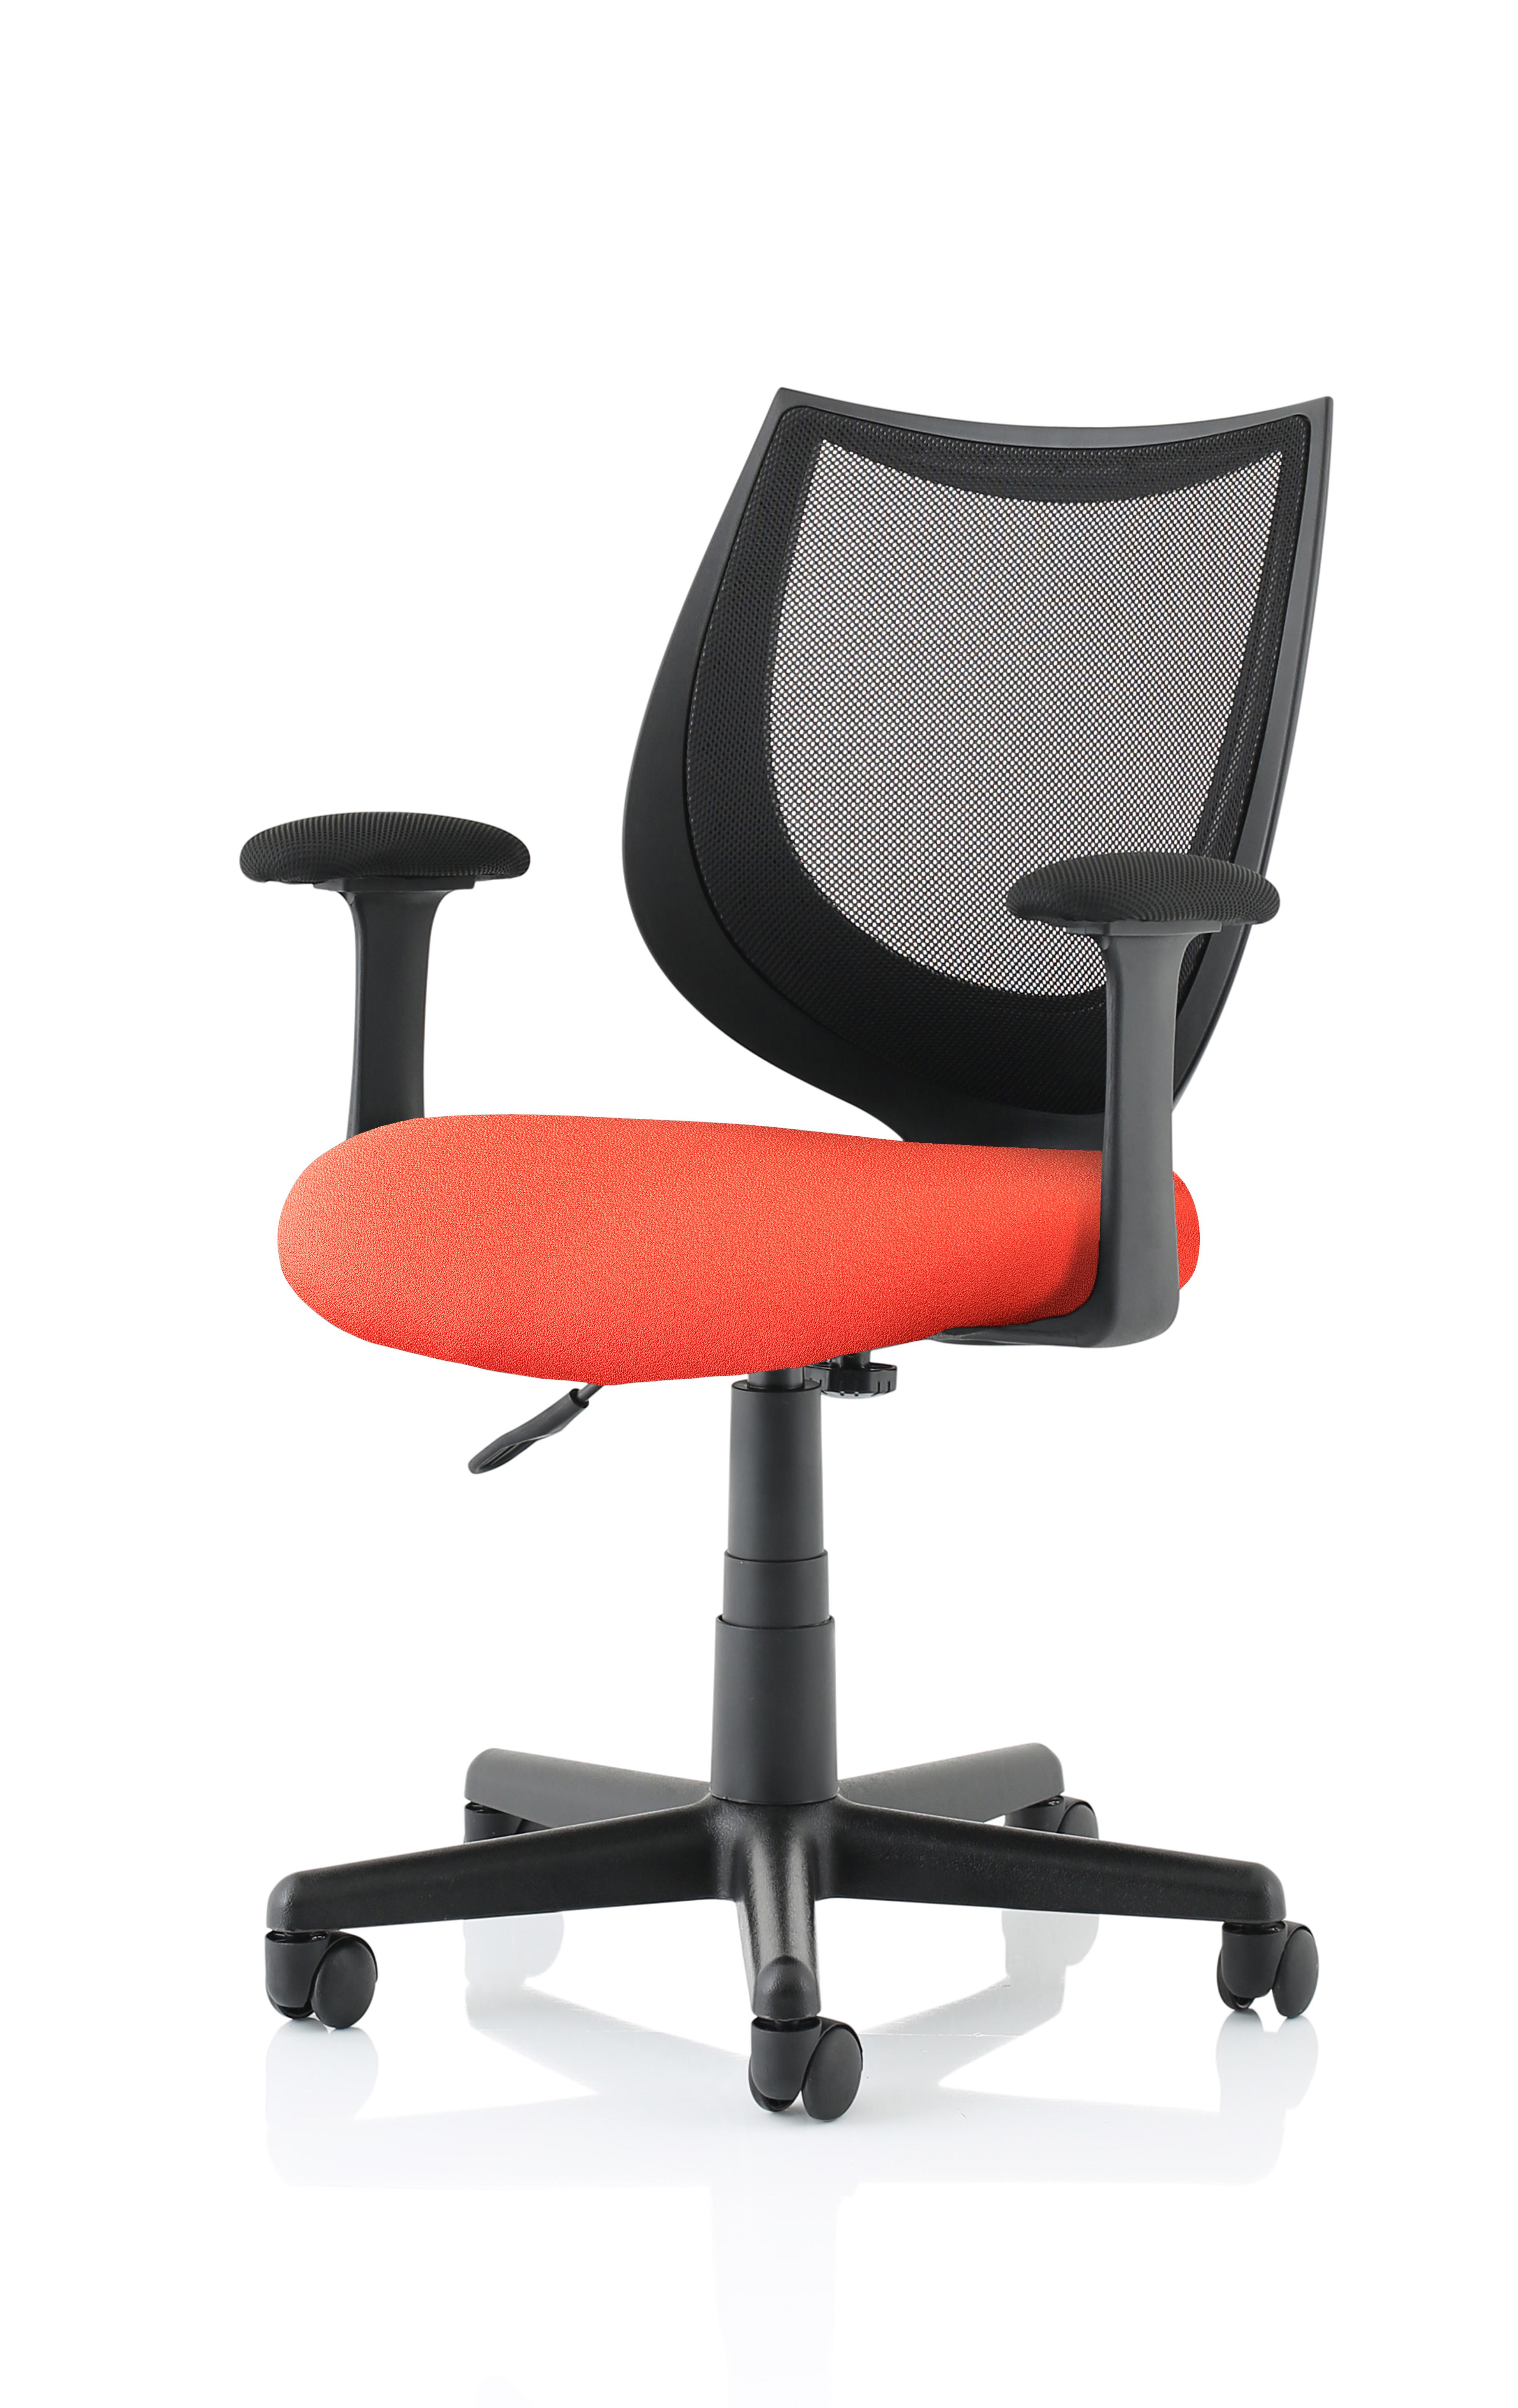 Camden Black Mesh Chair in Tabasco Red